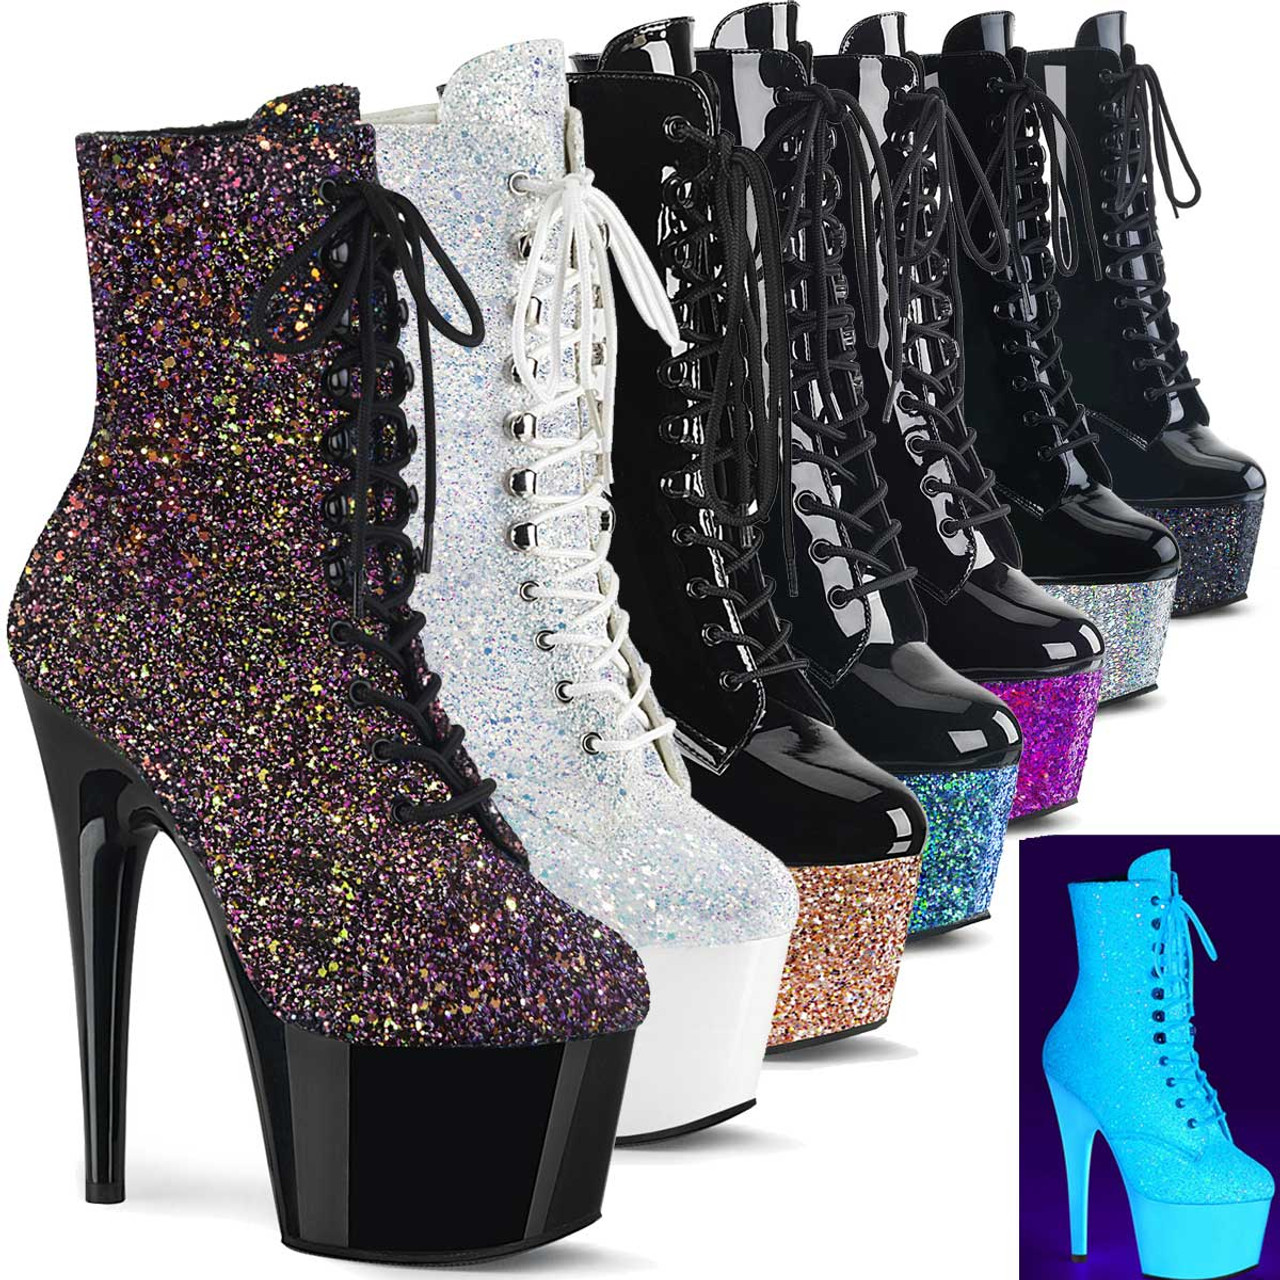 Details about  /Glitter Women Ultra High Block Heels Platform Boots Pu Leather Party Shoes Jin20